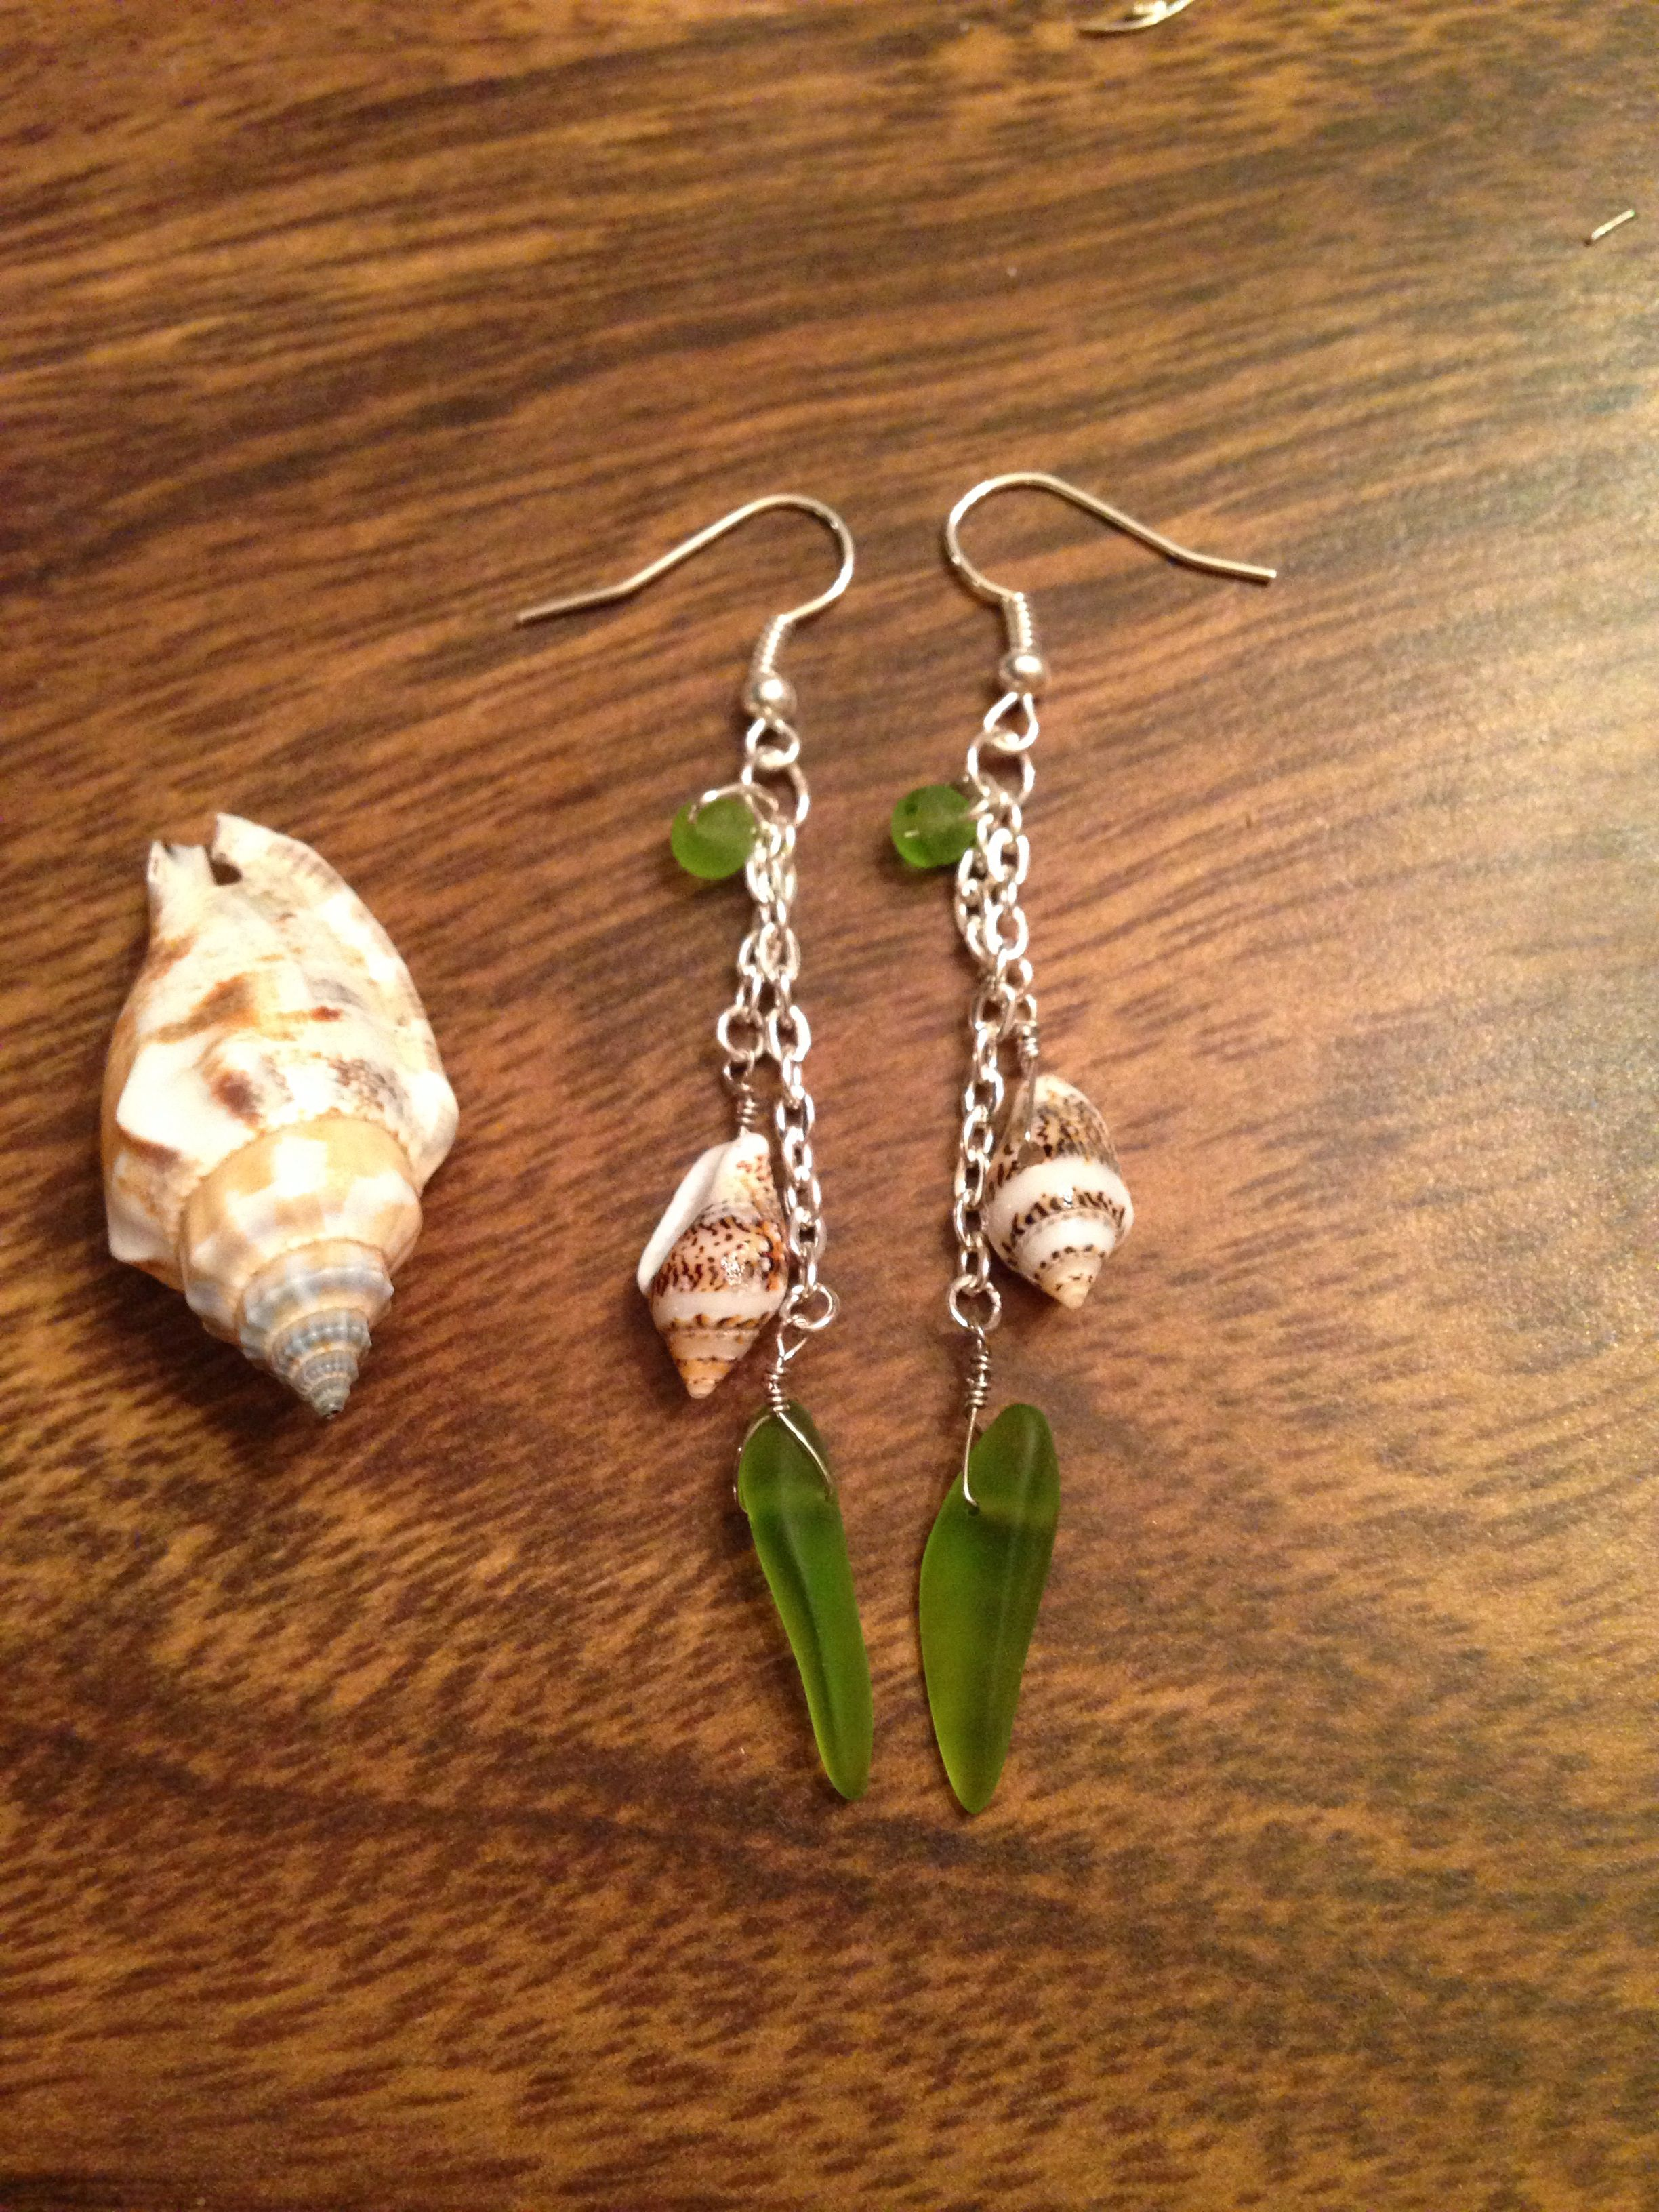 Green Sea glass and shell dangle earrings